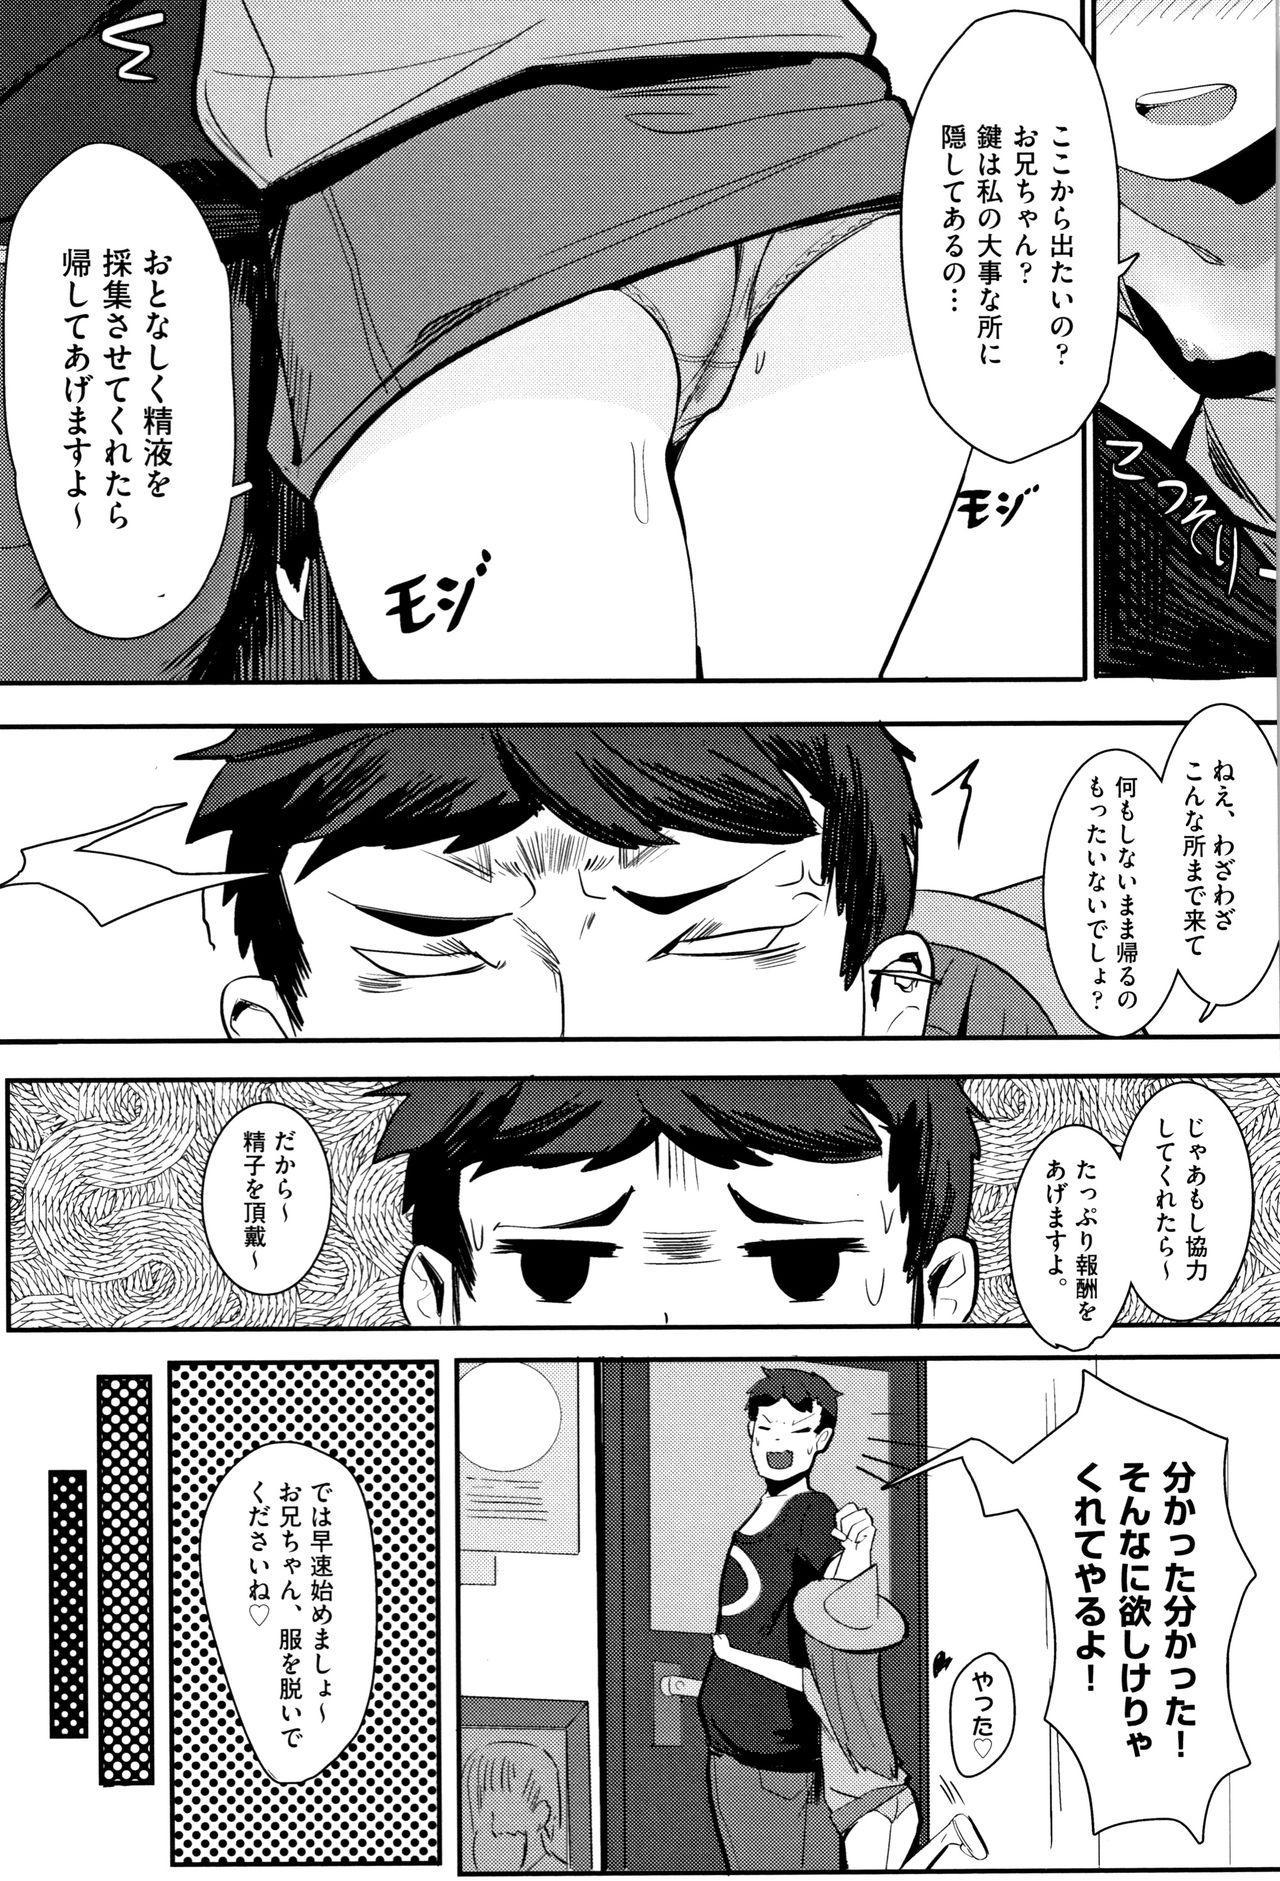 Shoujo Kumikyoku 11 95